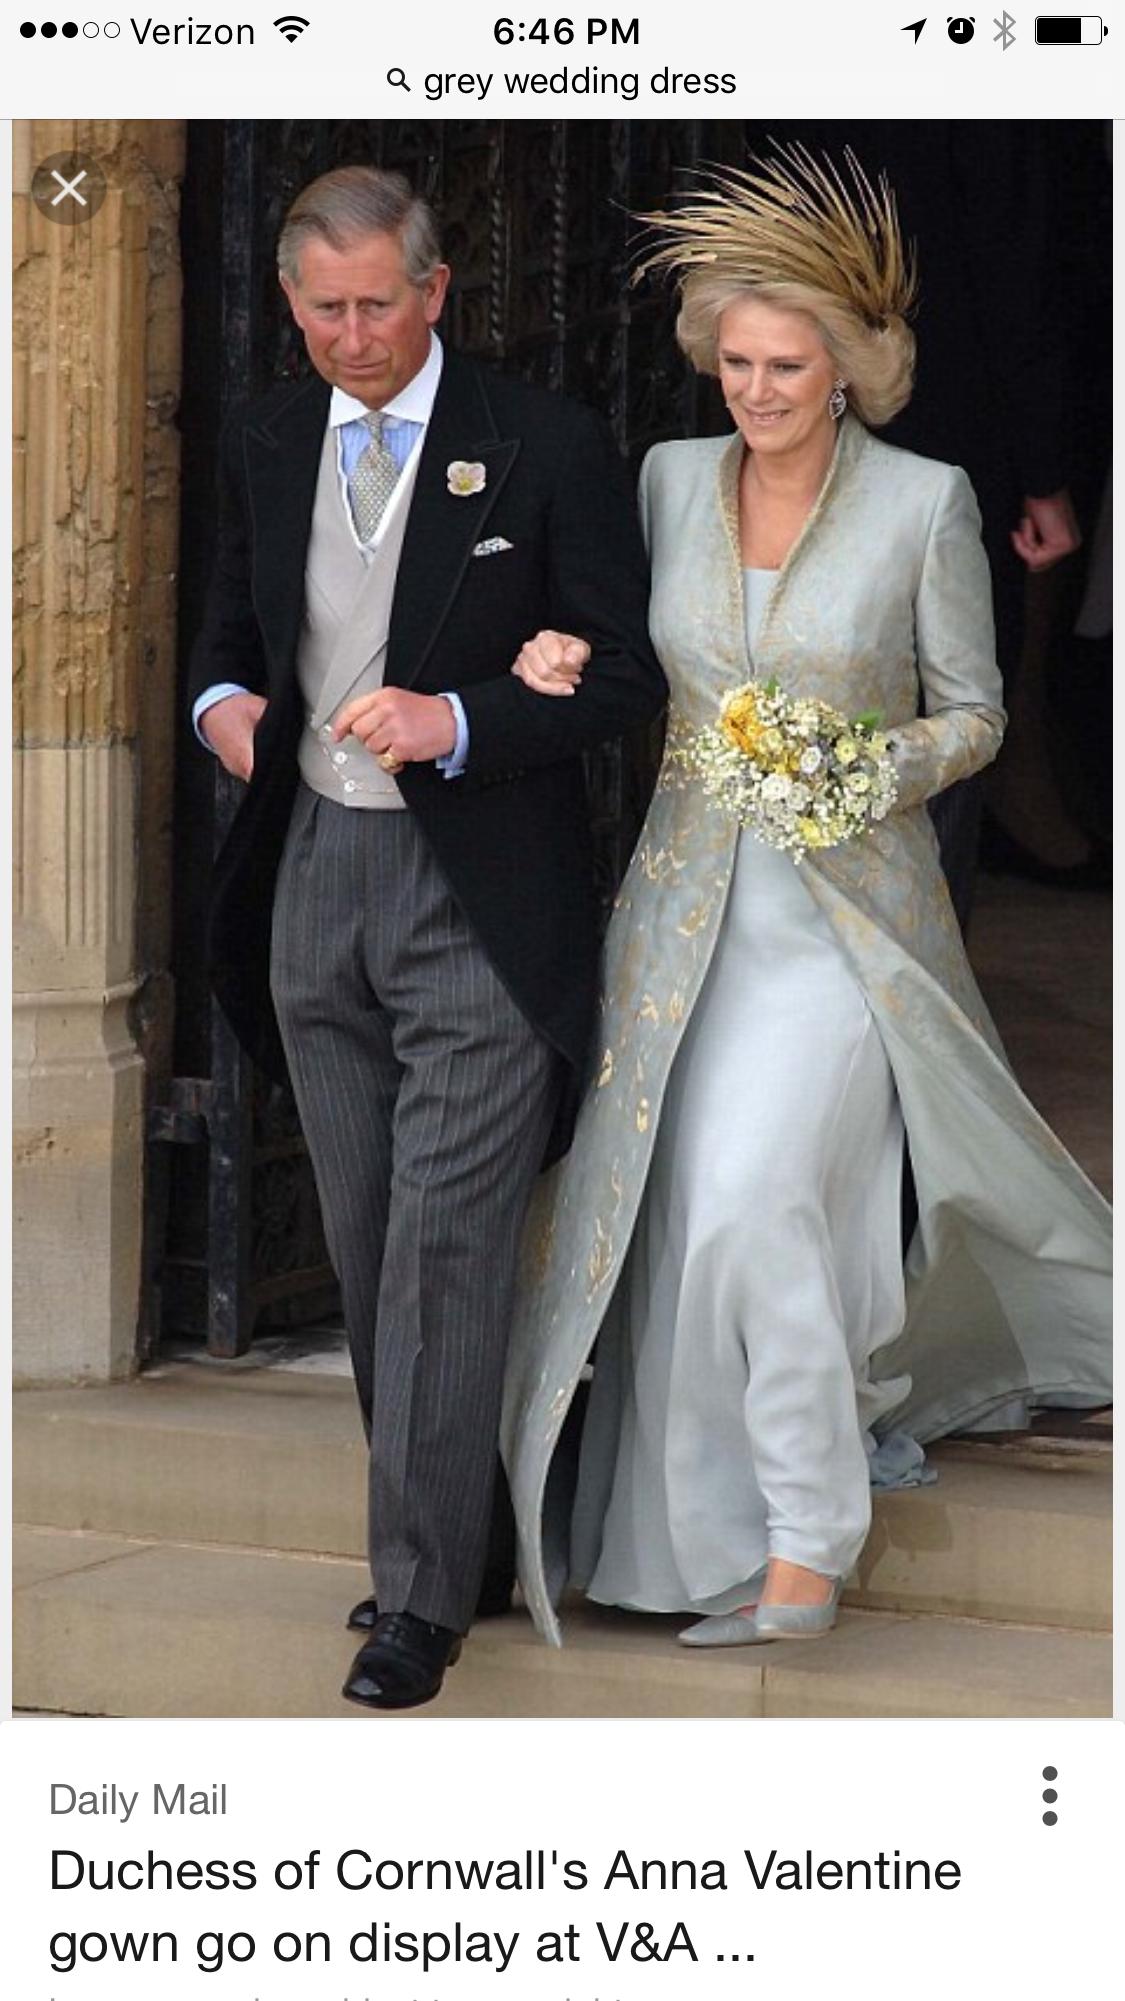 Pin by ida de klerk on bruiden pinterest royal weddings camilla